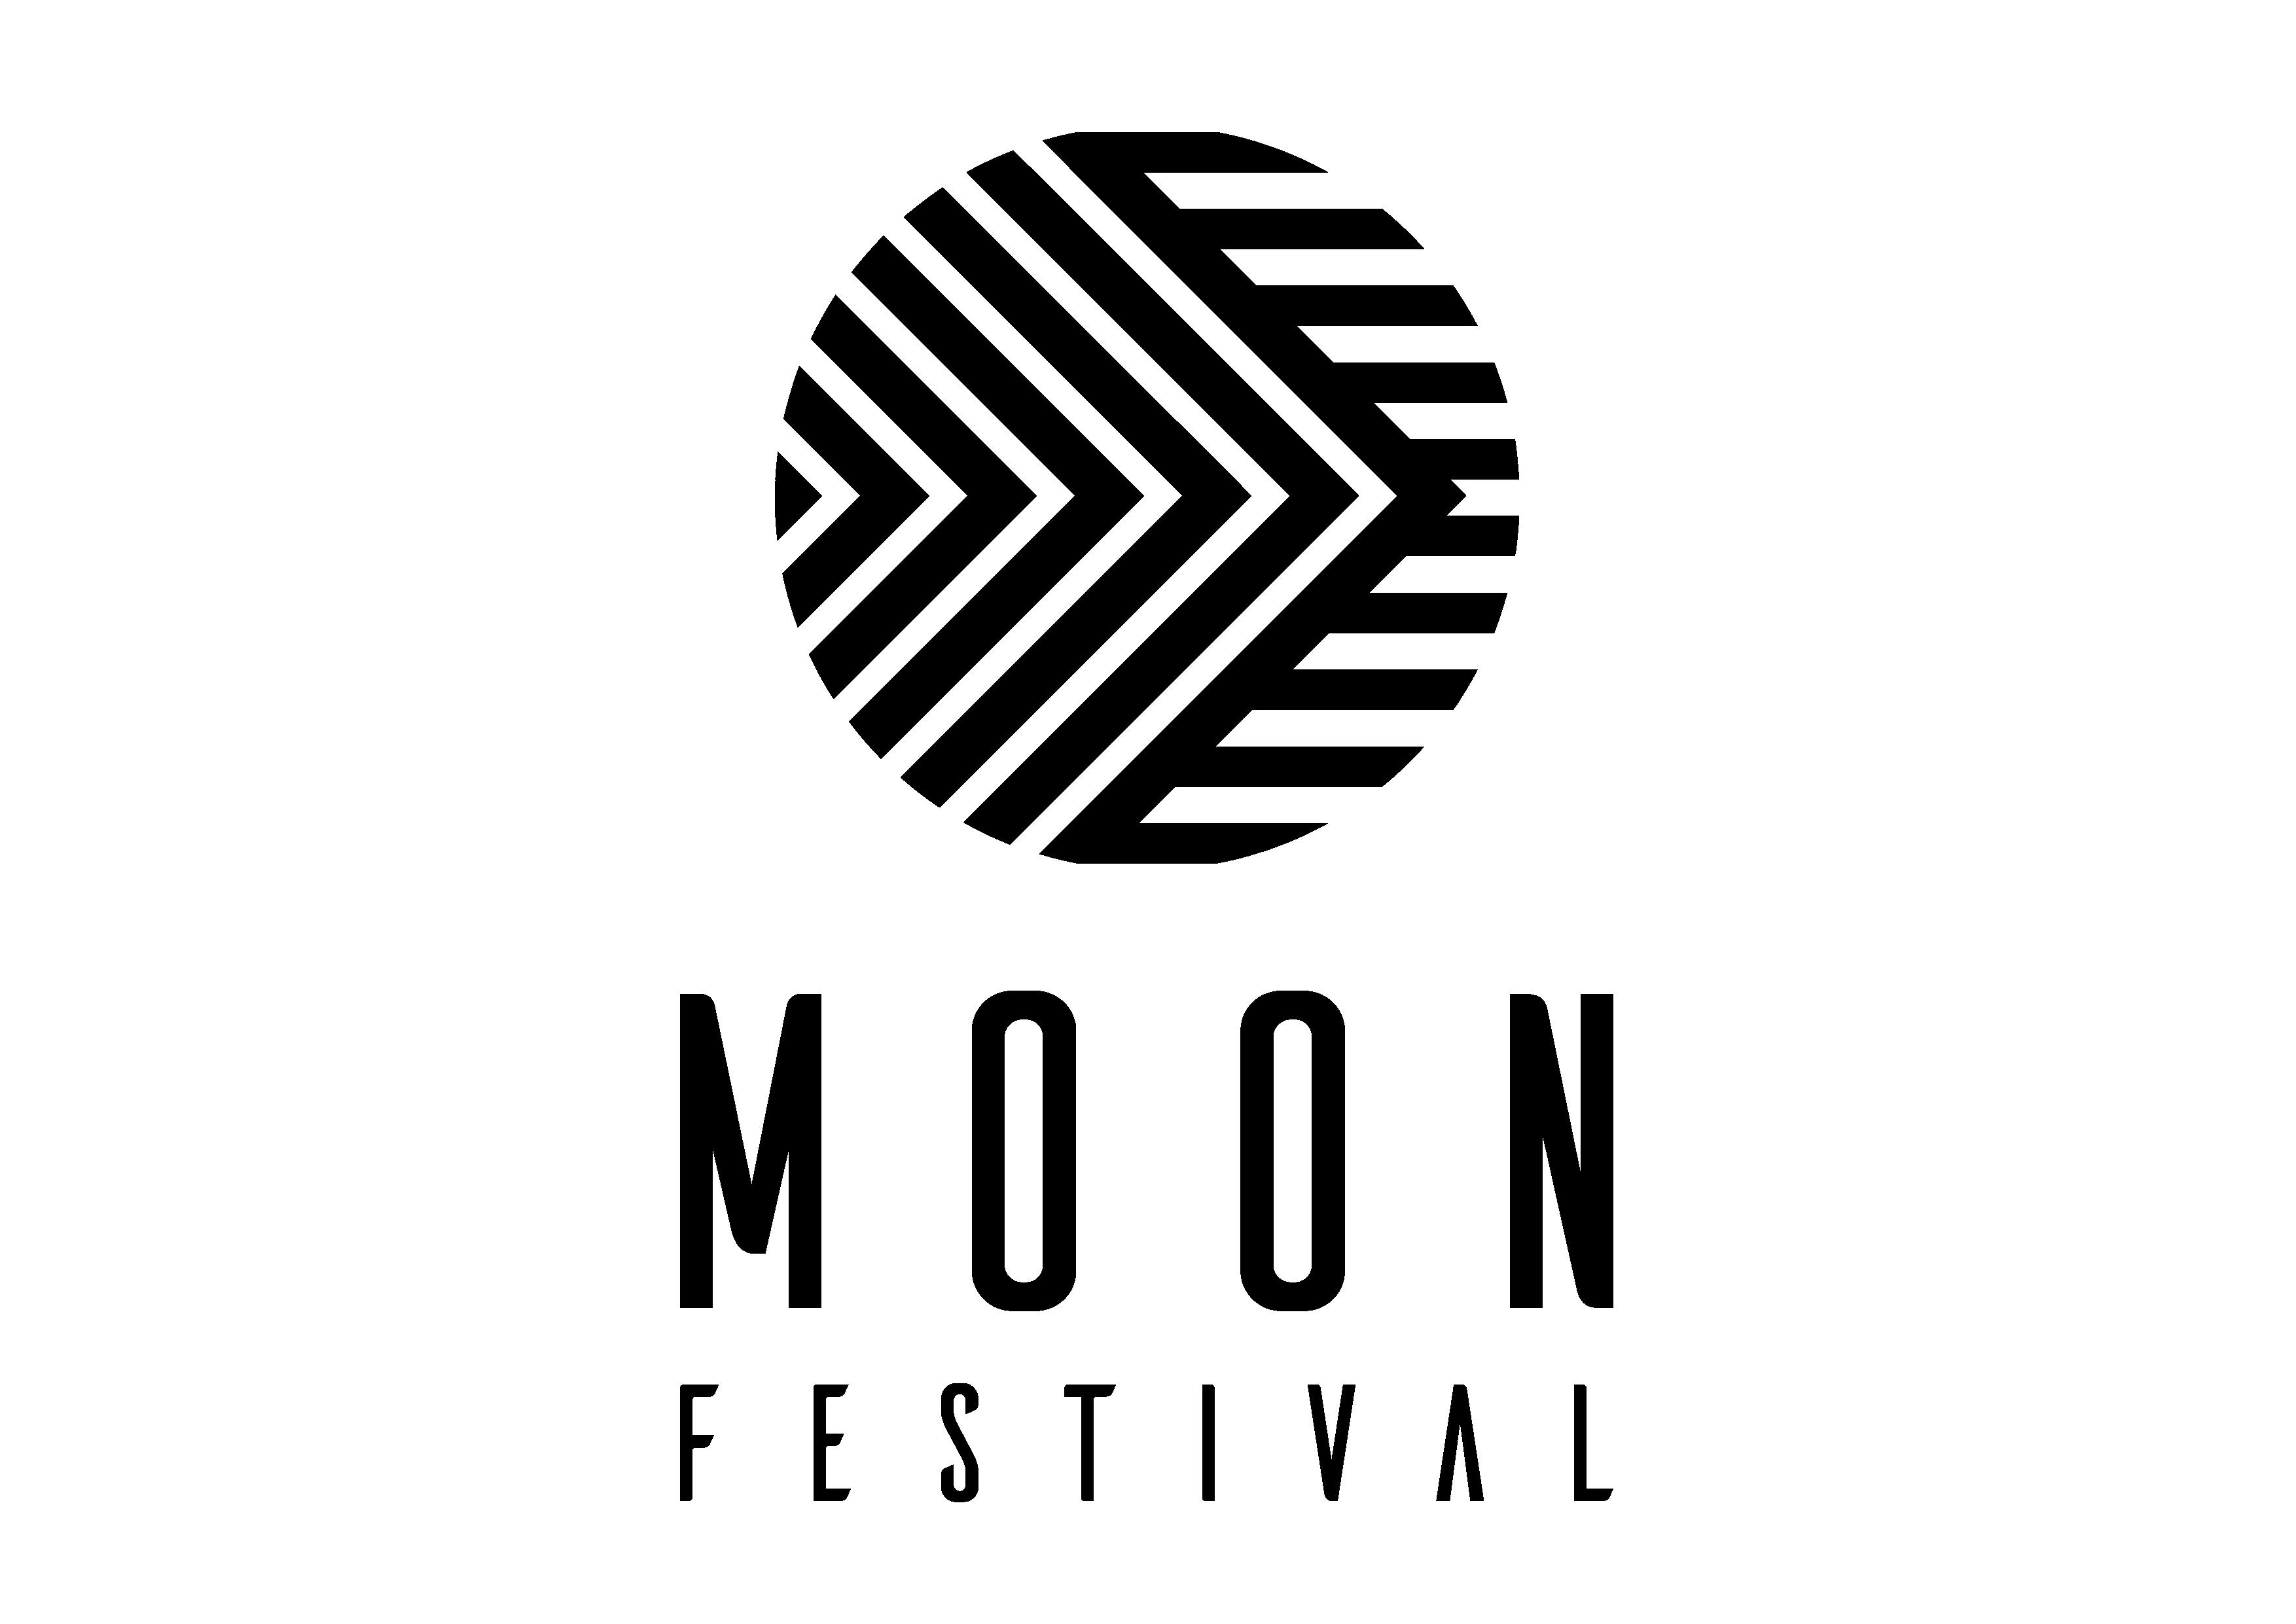 logos-2-waxing-crescent